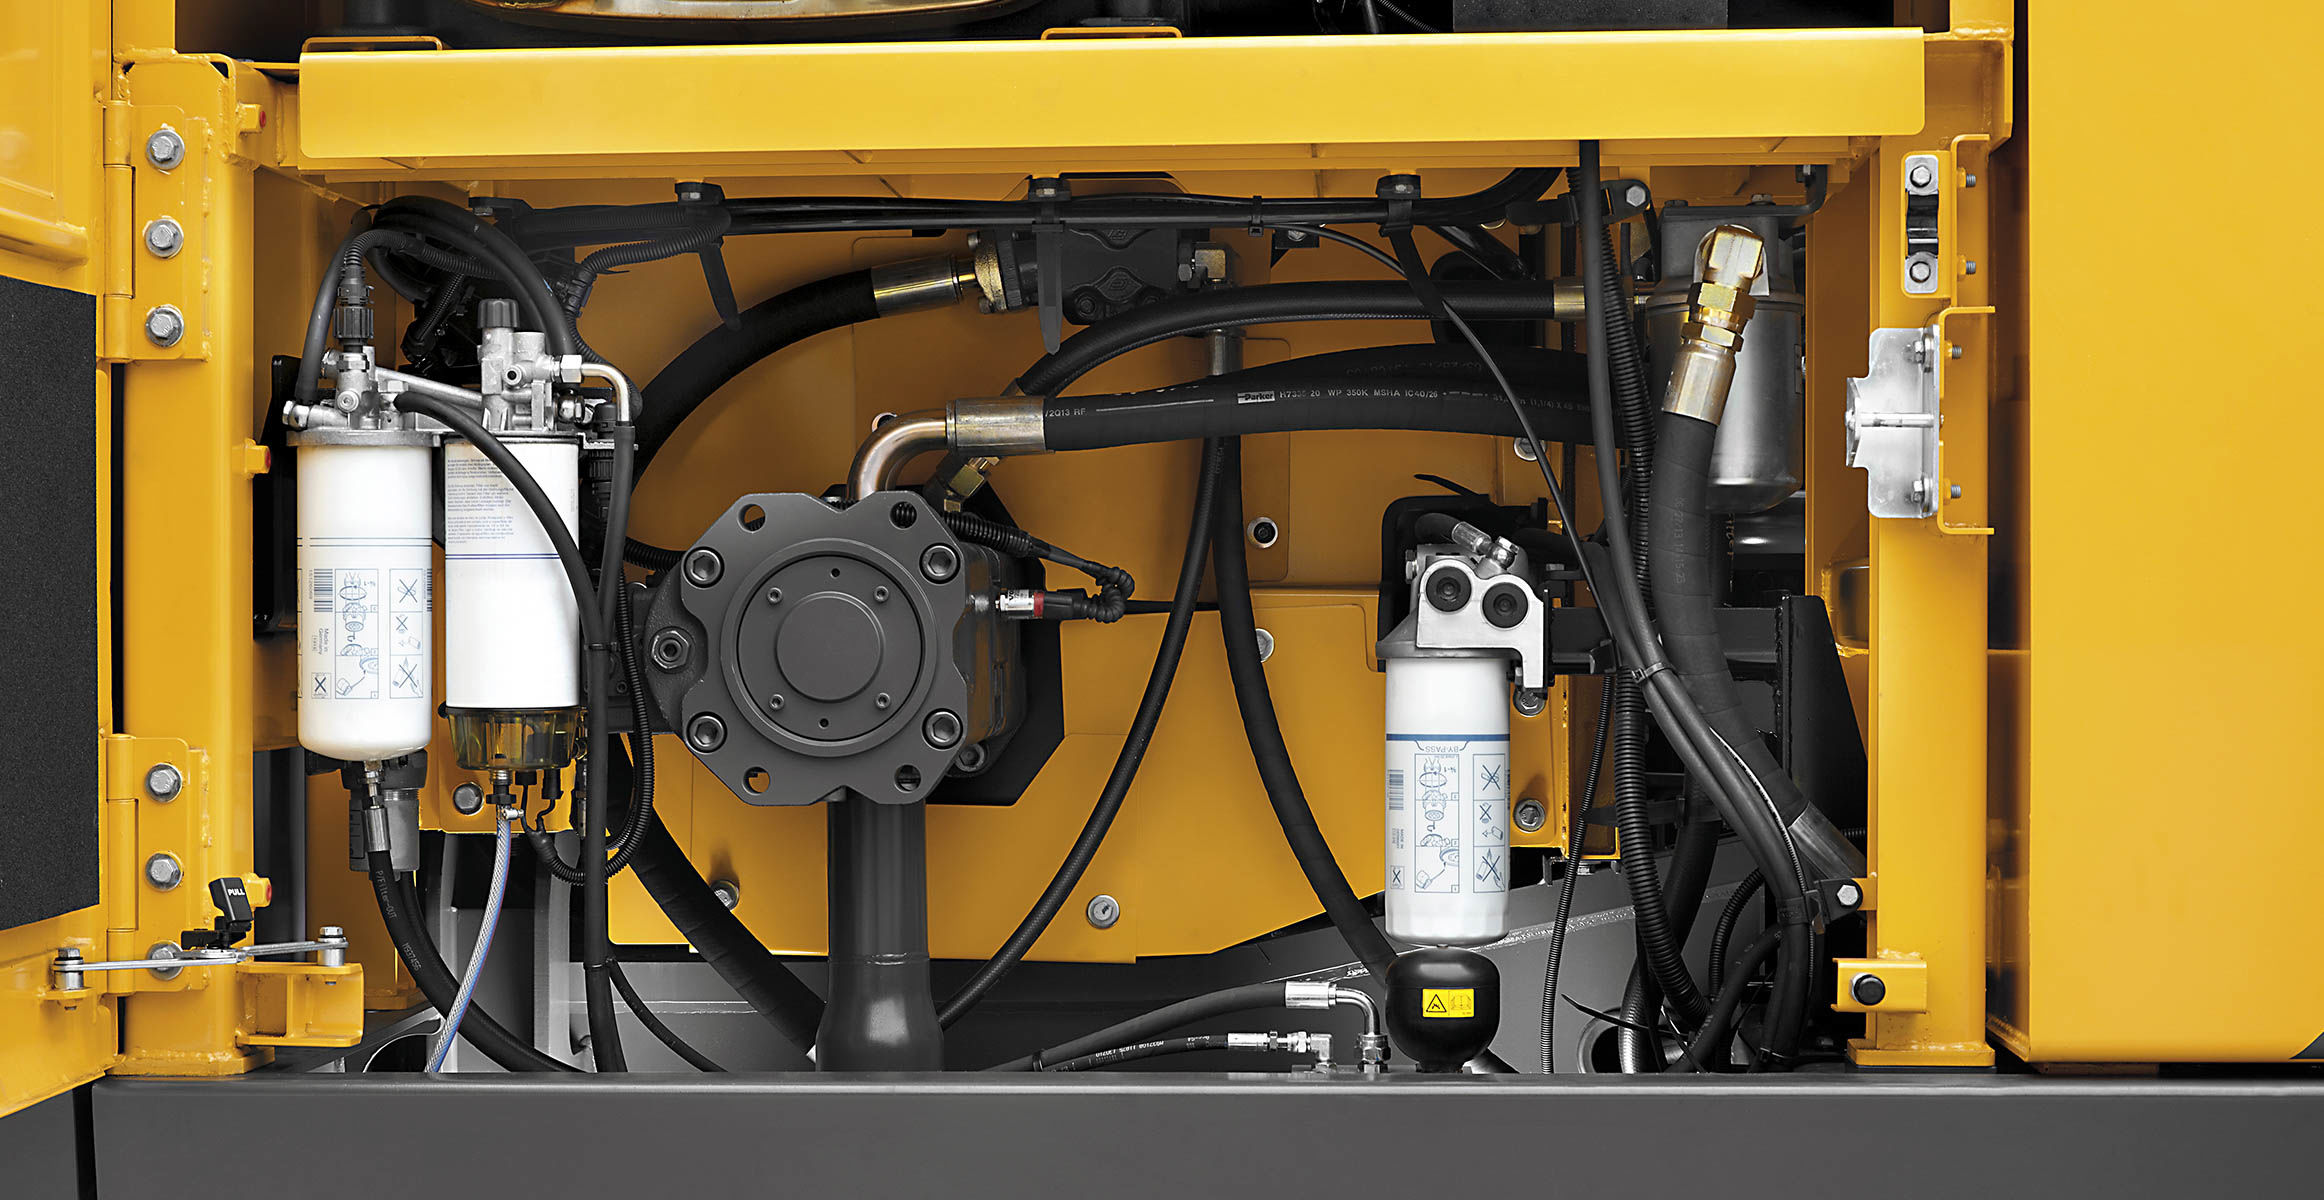 EC380E | Excavators | Overview | Volvo Construction Equipment